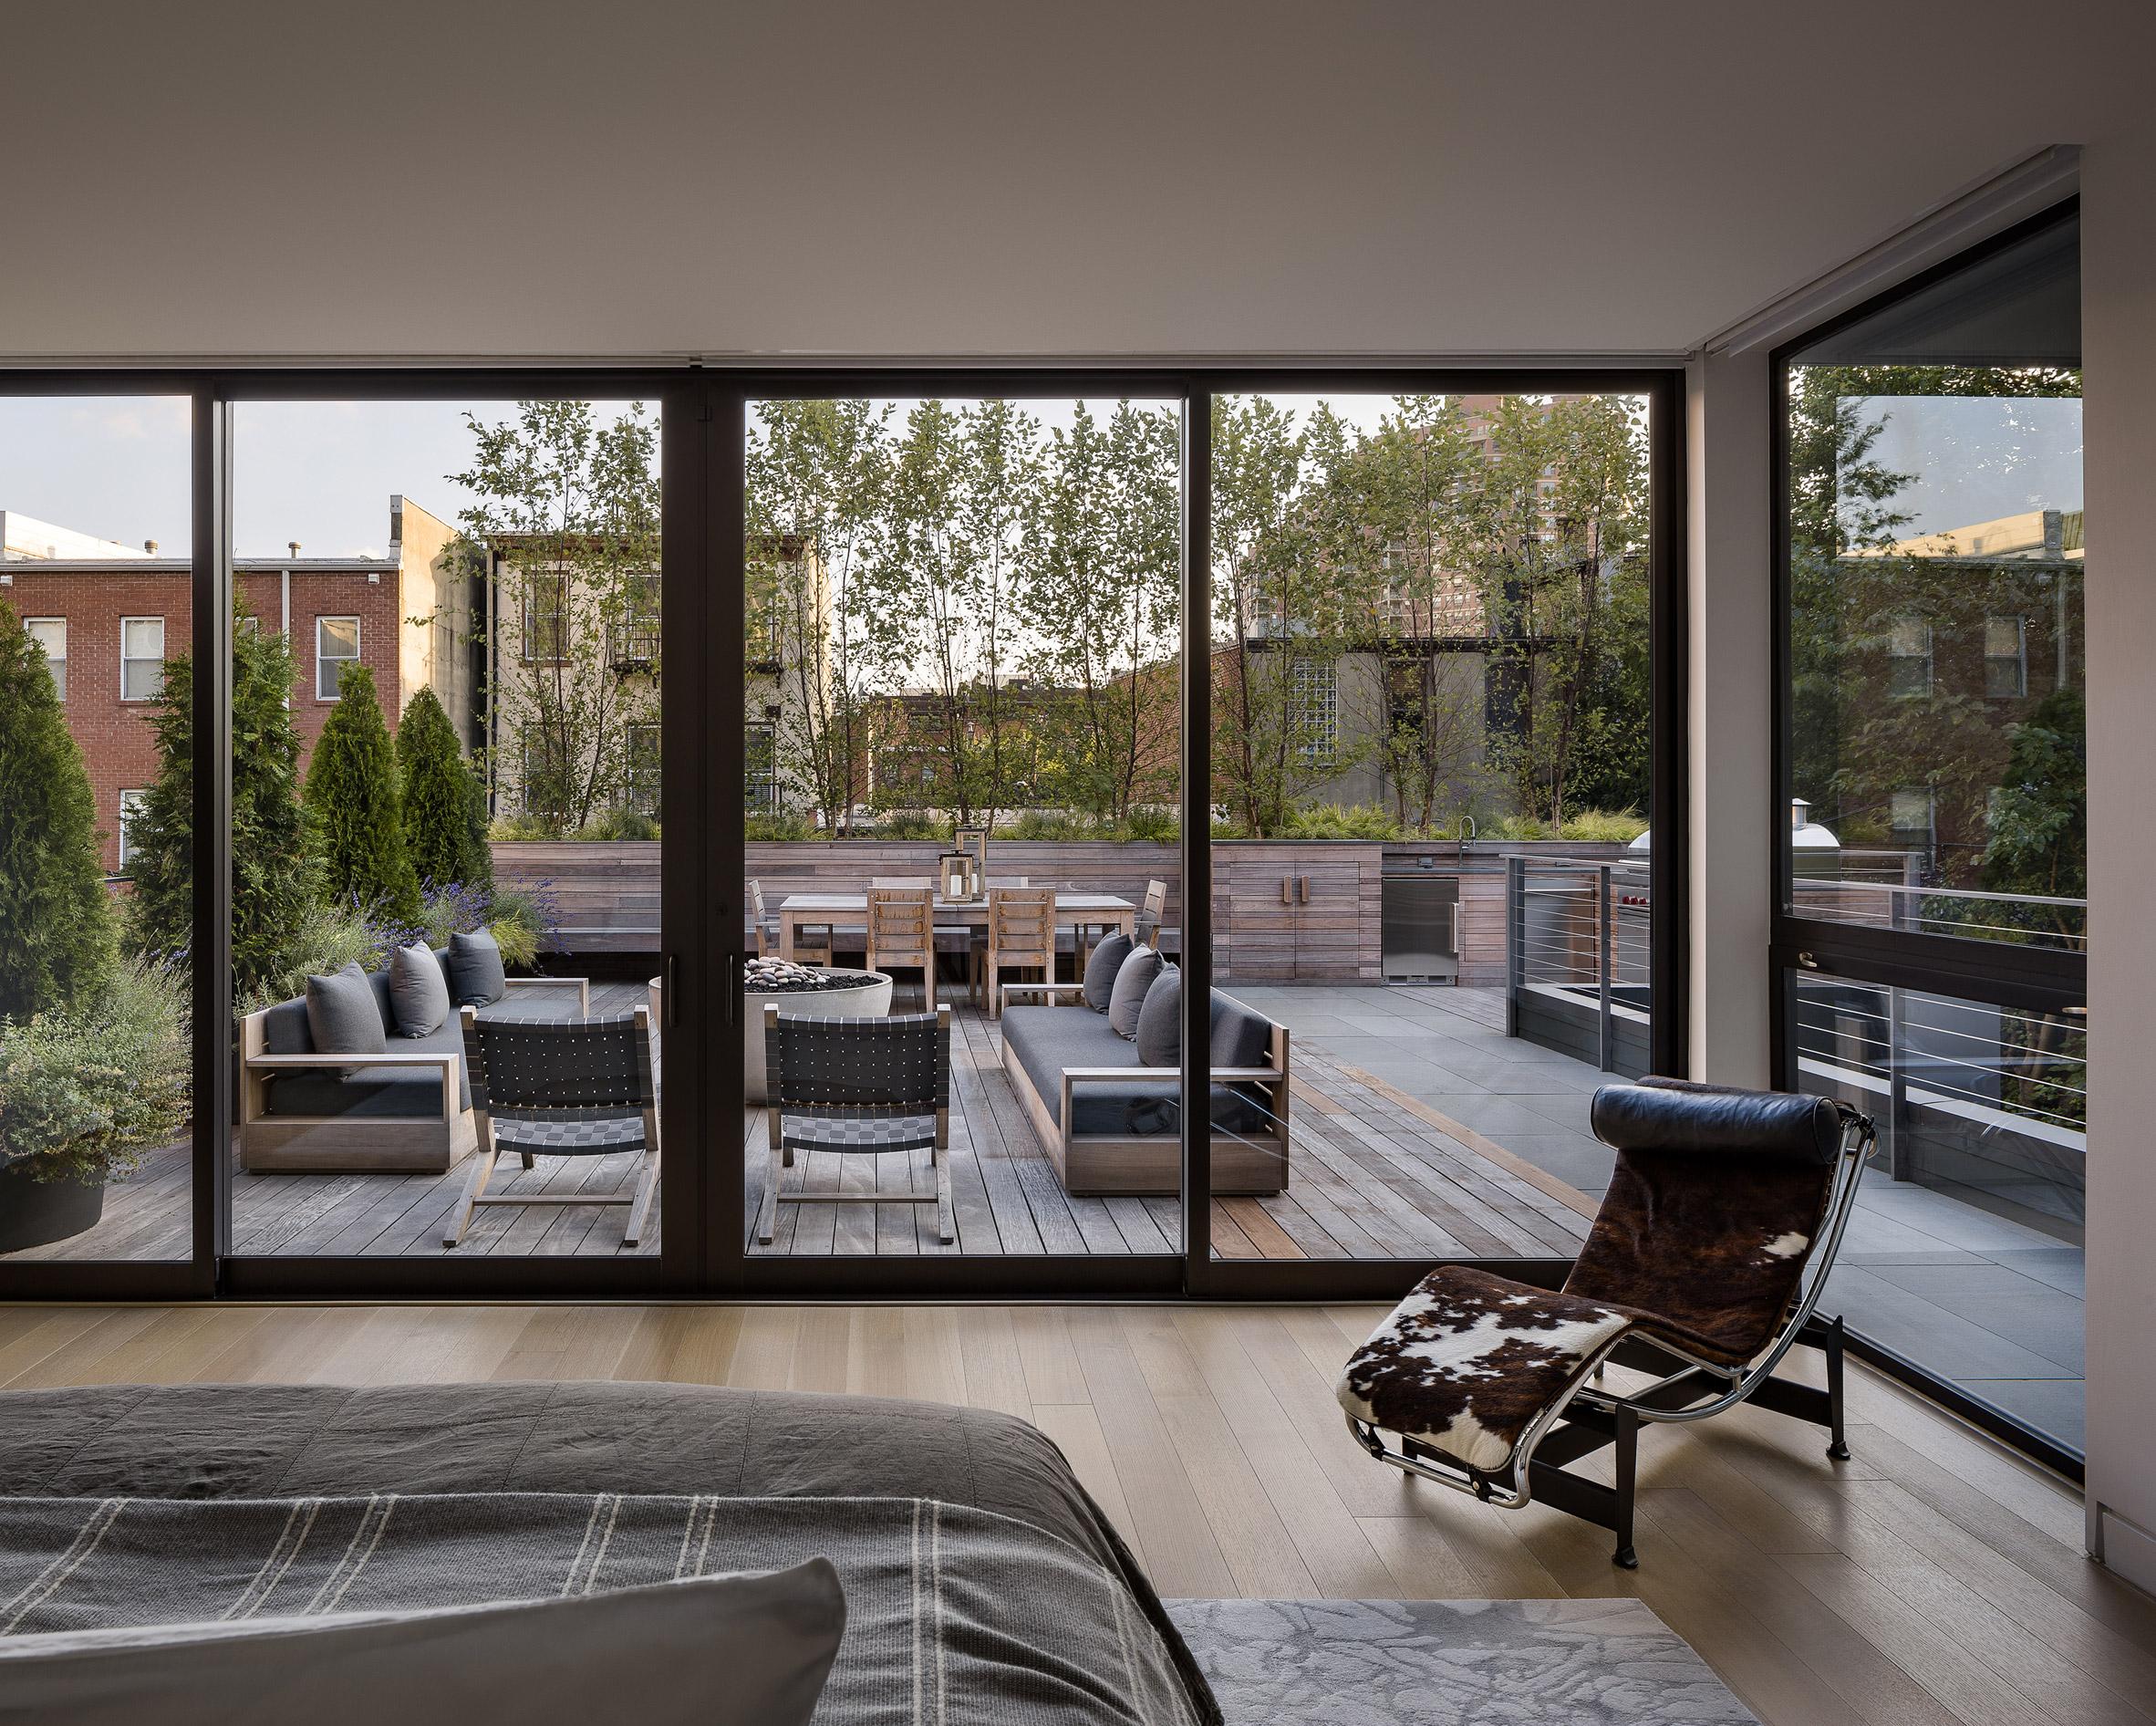 paulus-hook-residence-fogarty-finger-interiors-new-jersey-usa_dezeen_2364_col_9.jpg